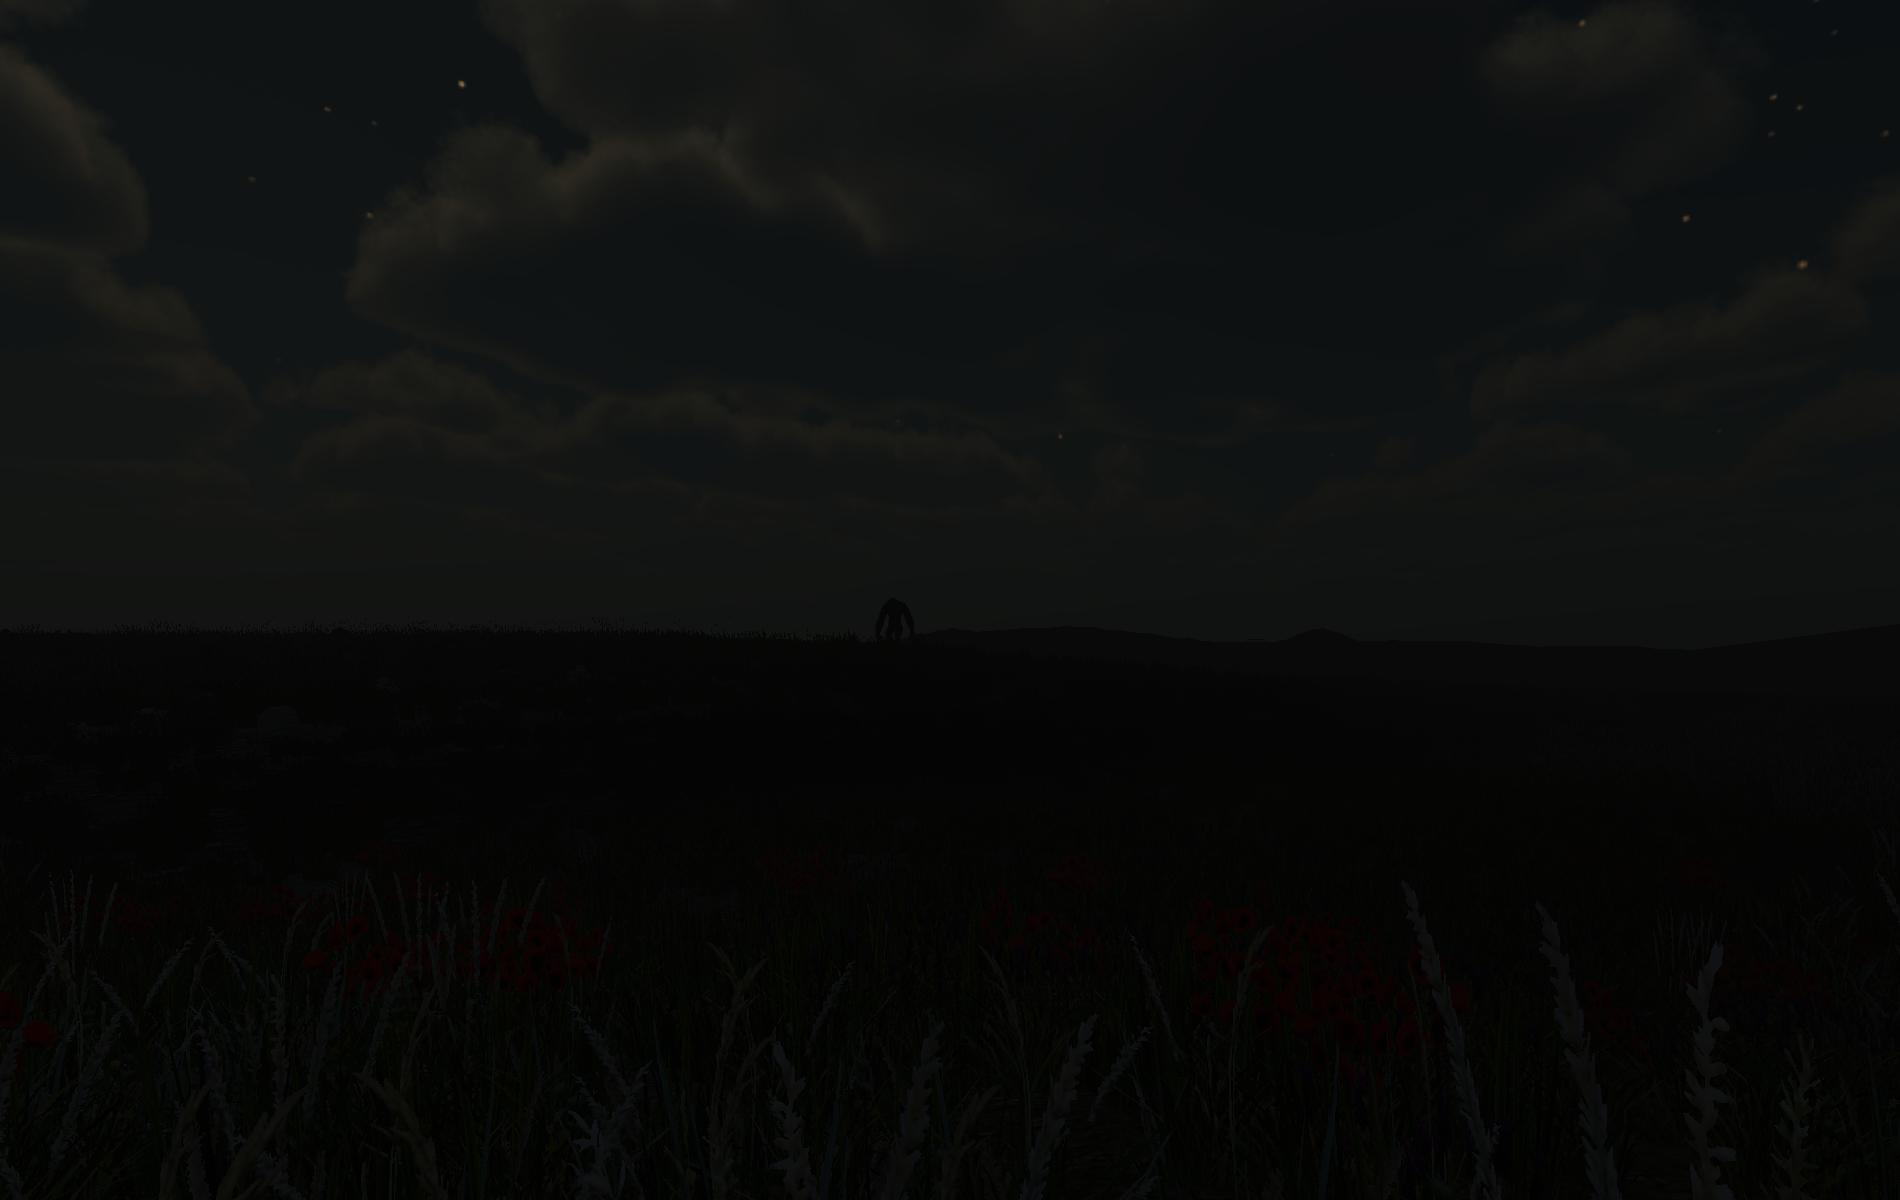 Night view of creature in the di